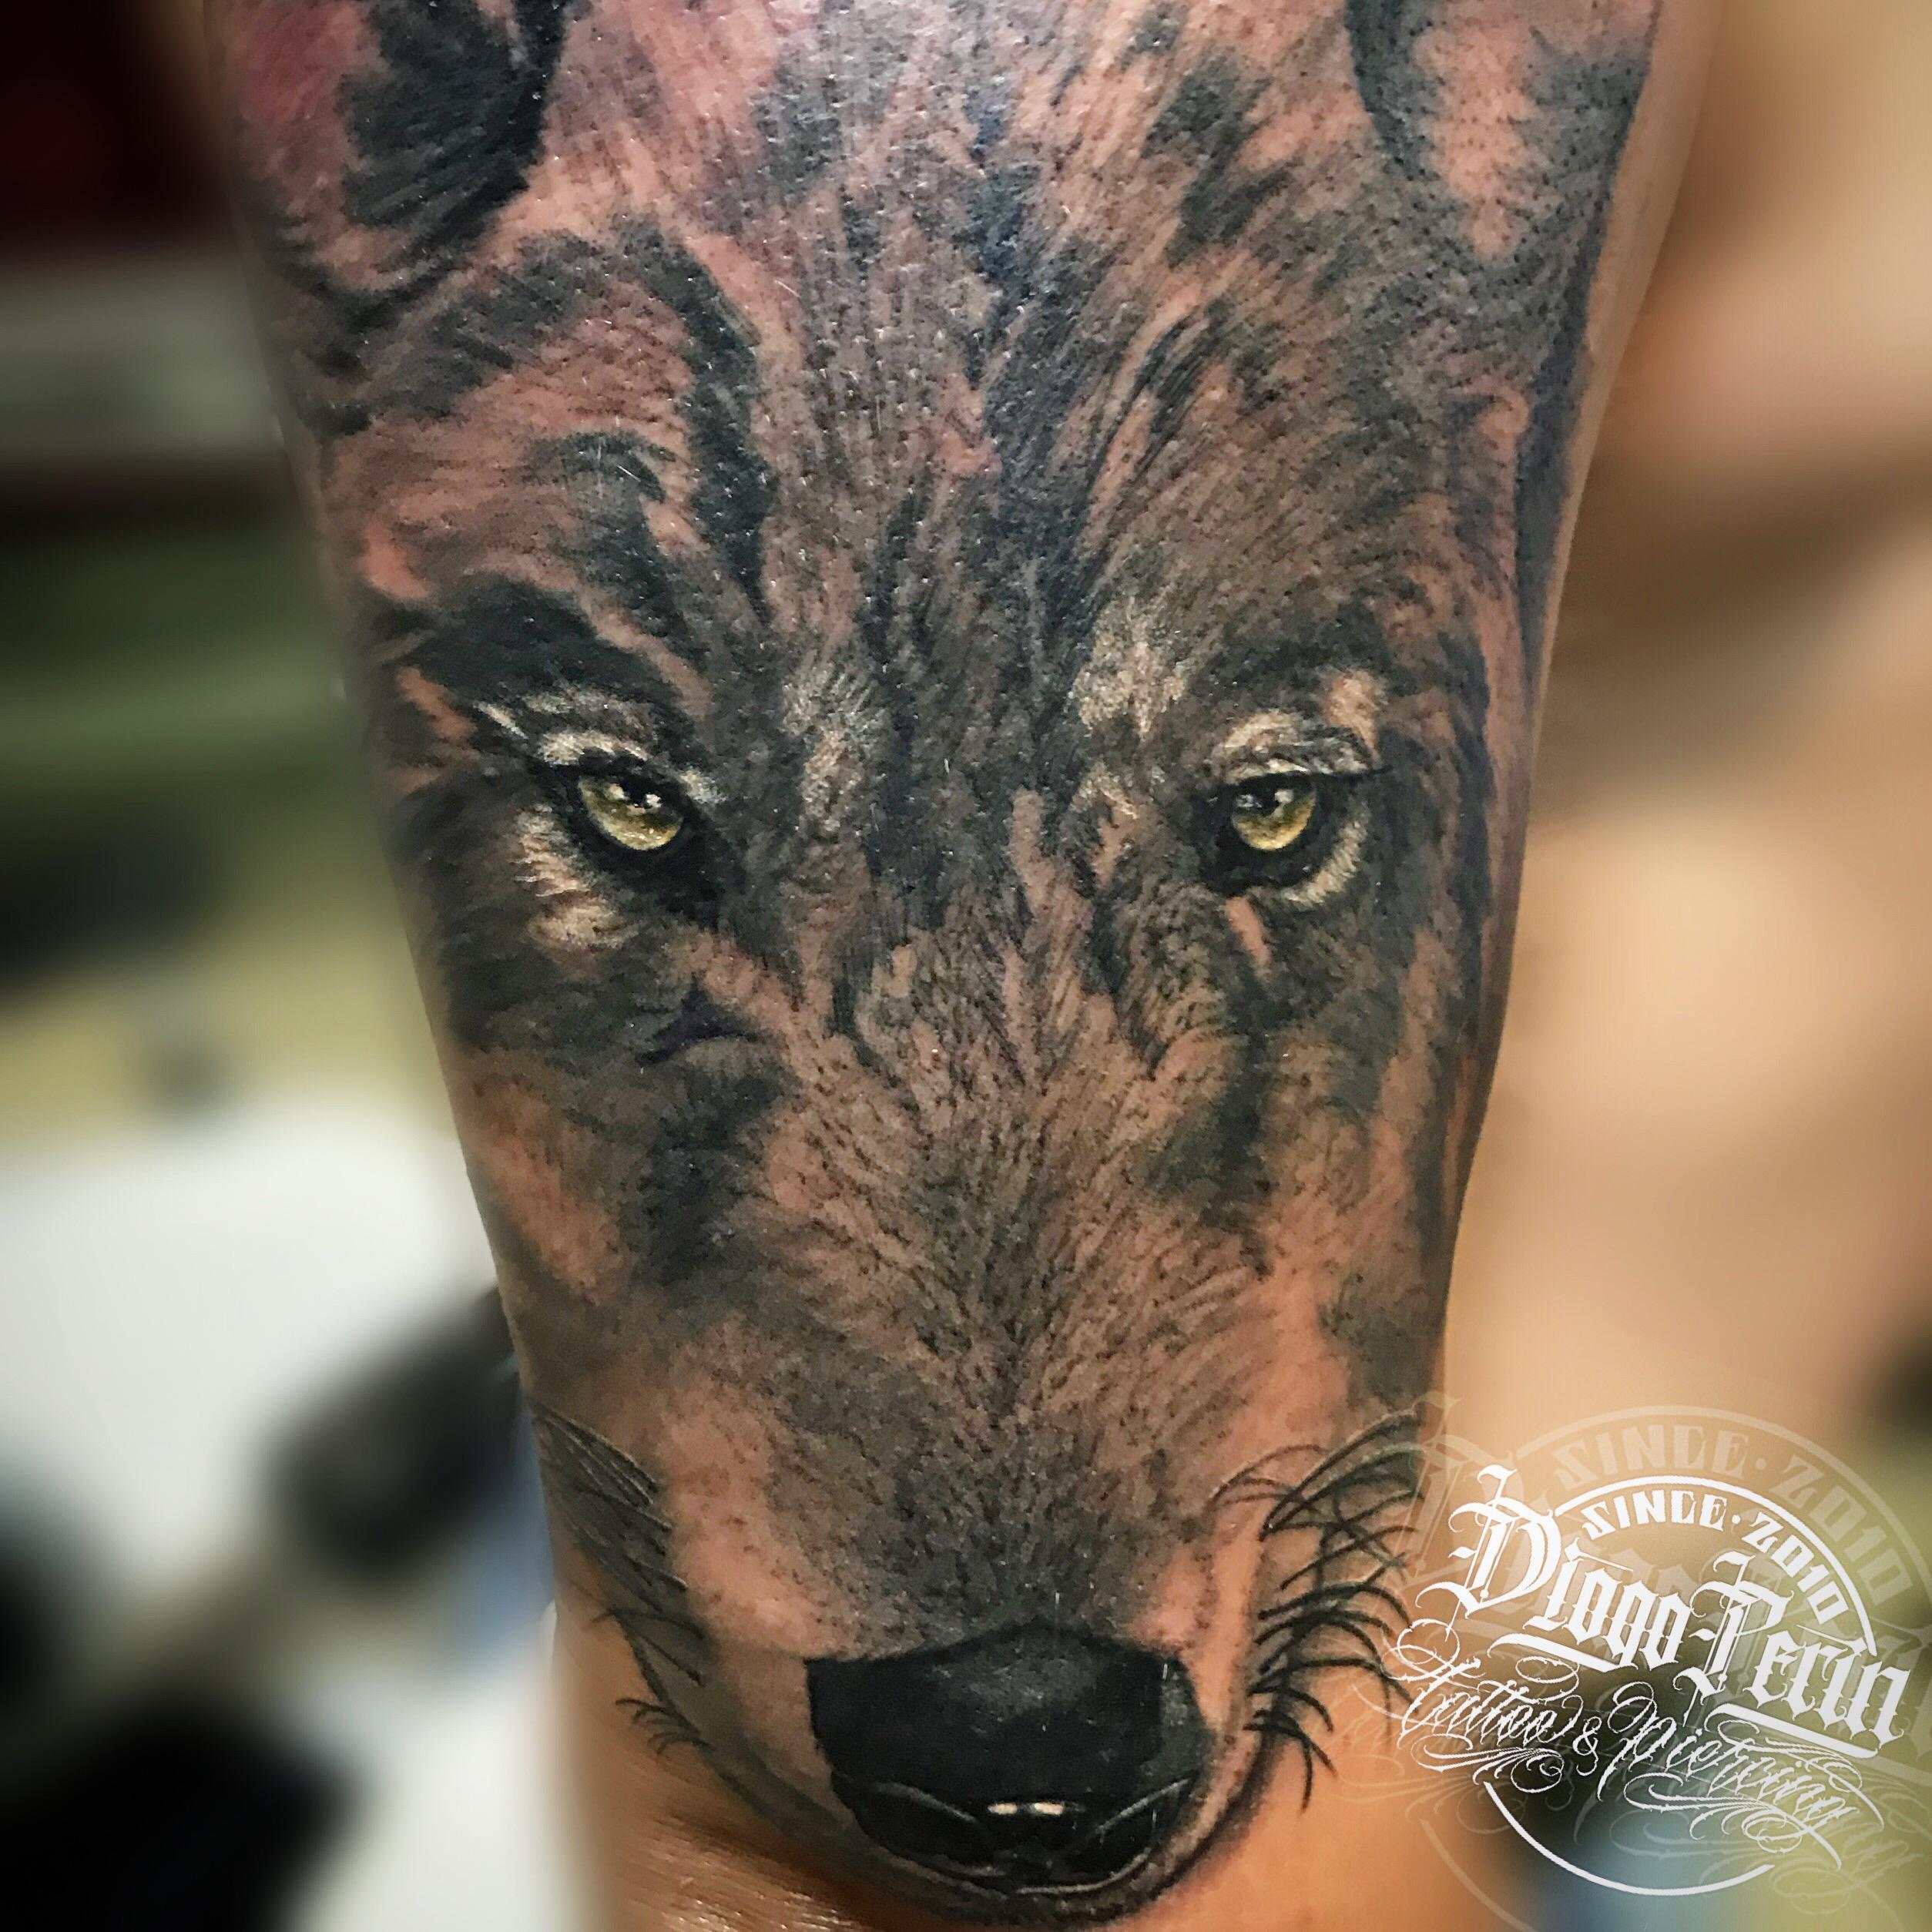 Tatuaje realizado por @diogoperin #wolf #realism #wild #blackandwhite #tattoospain #tattooalicante #tattoosantapola